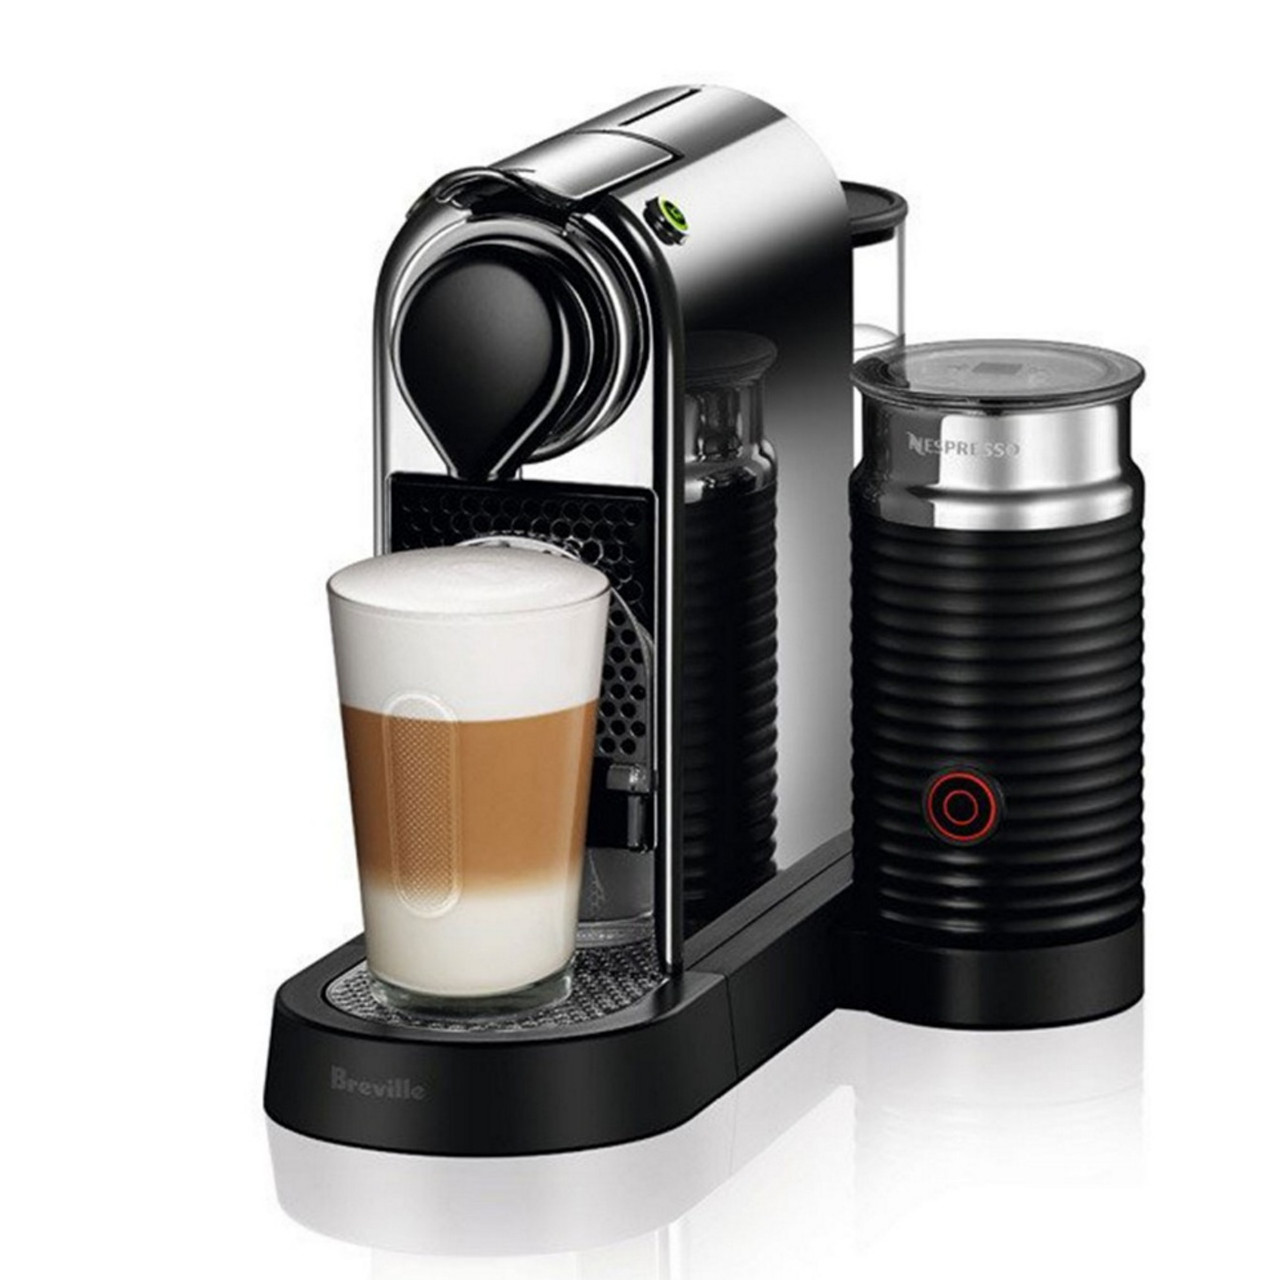 Breville BEC660CRO Nespresso CitiZ&milk Espresso Machine with Frother